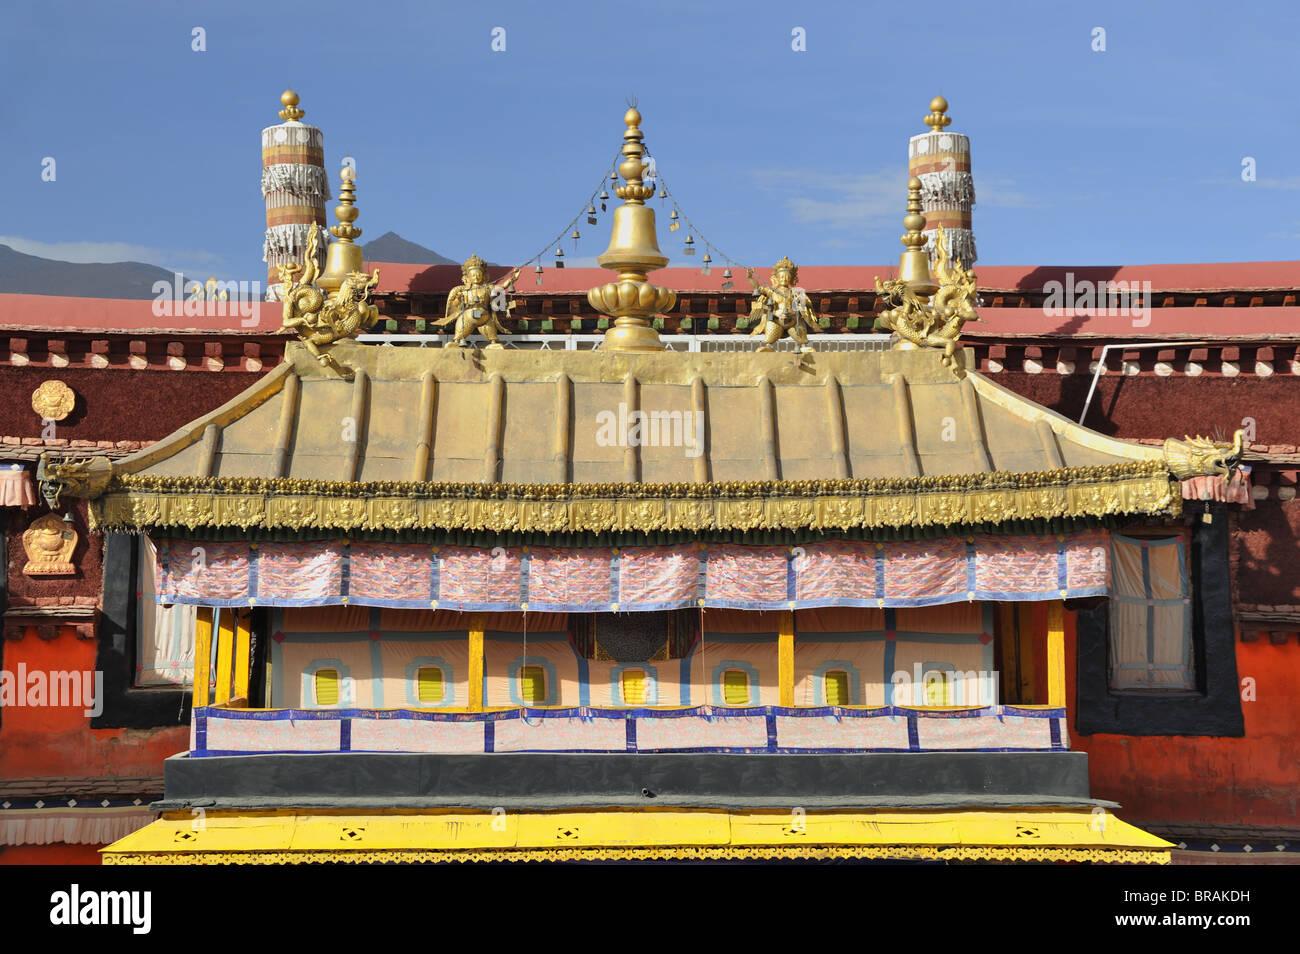 Jokhang Temple. Lhasa, Tibet. - Stock Image